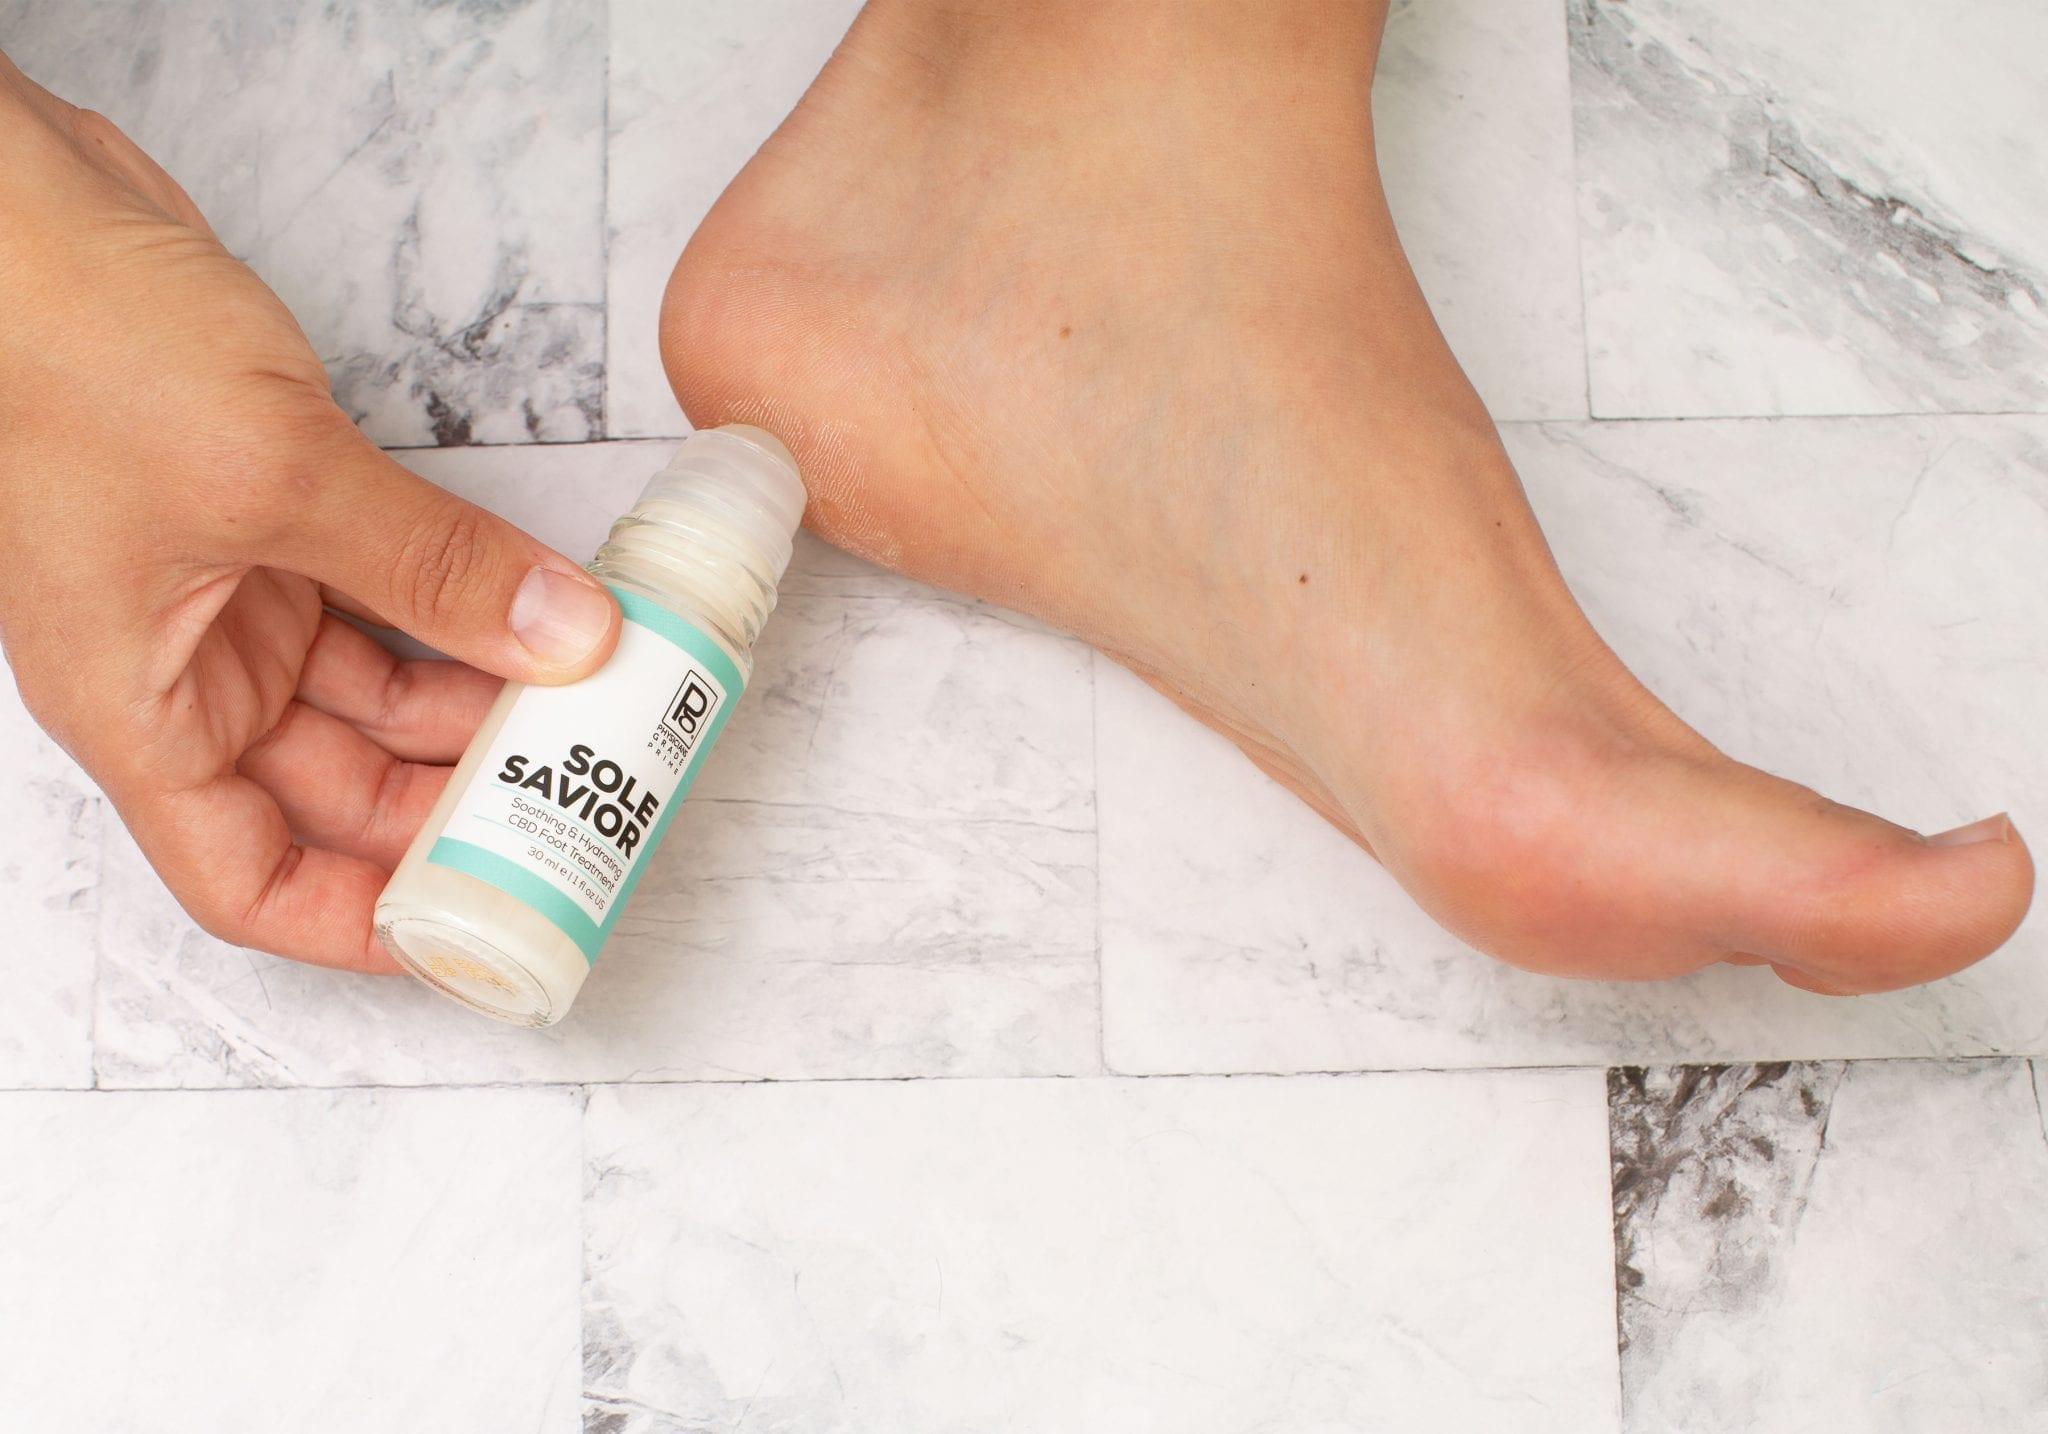 Sole Savior Foot Cream